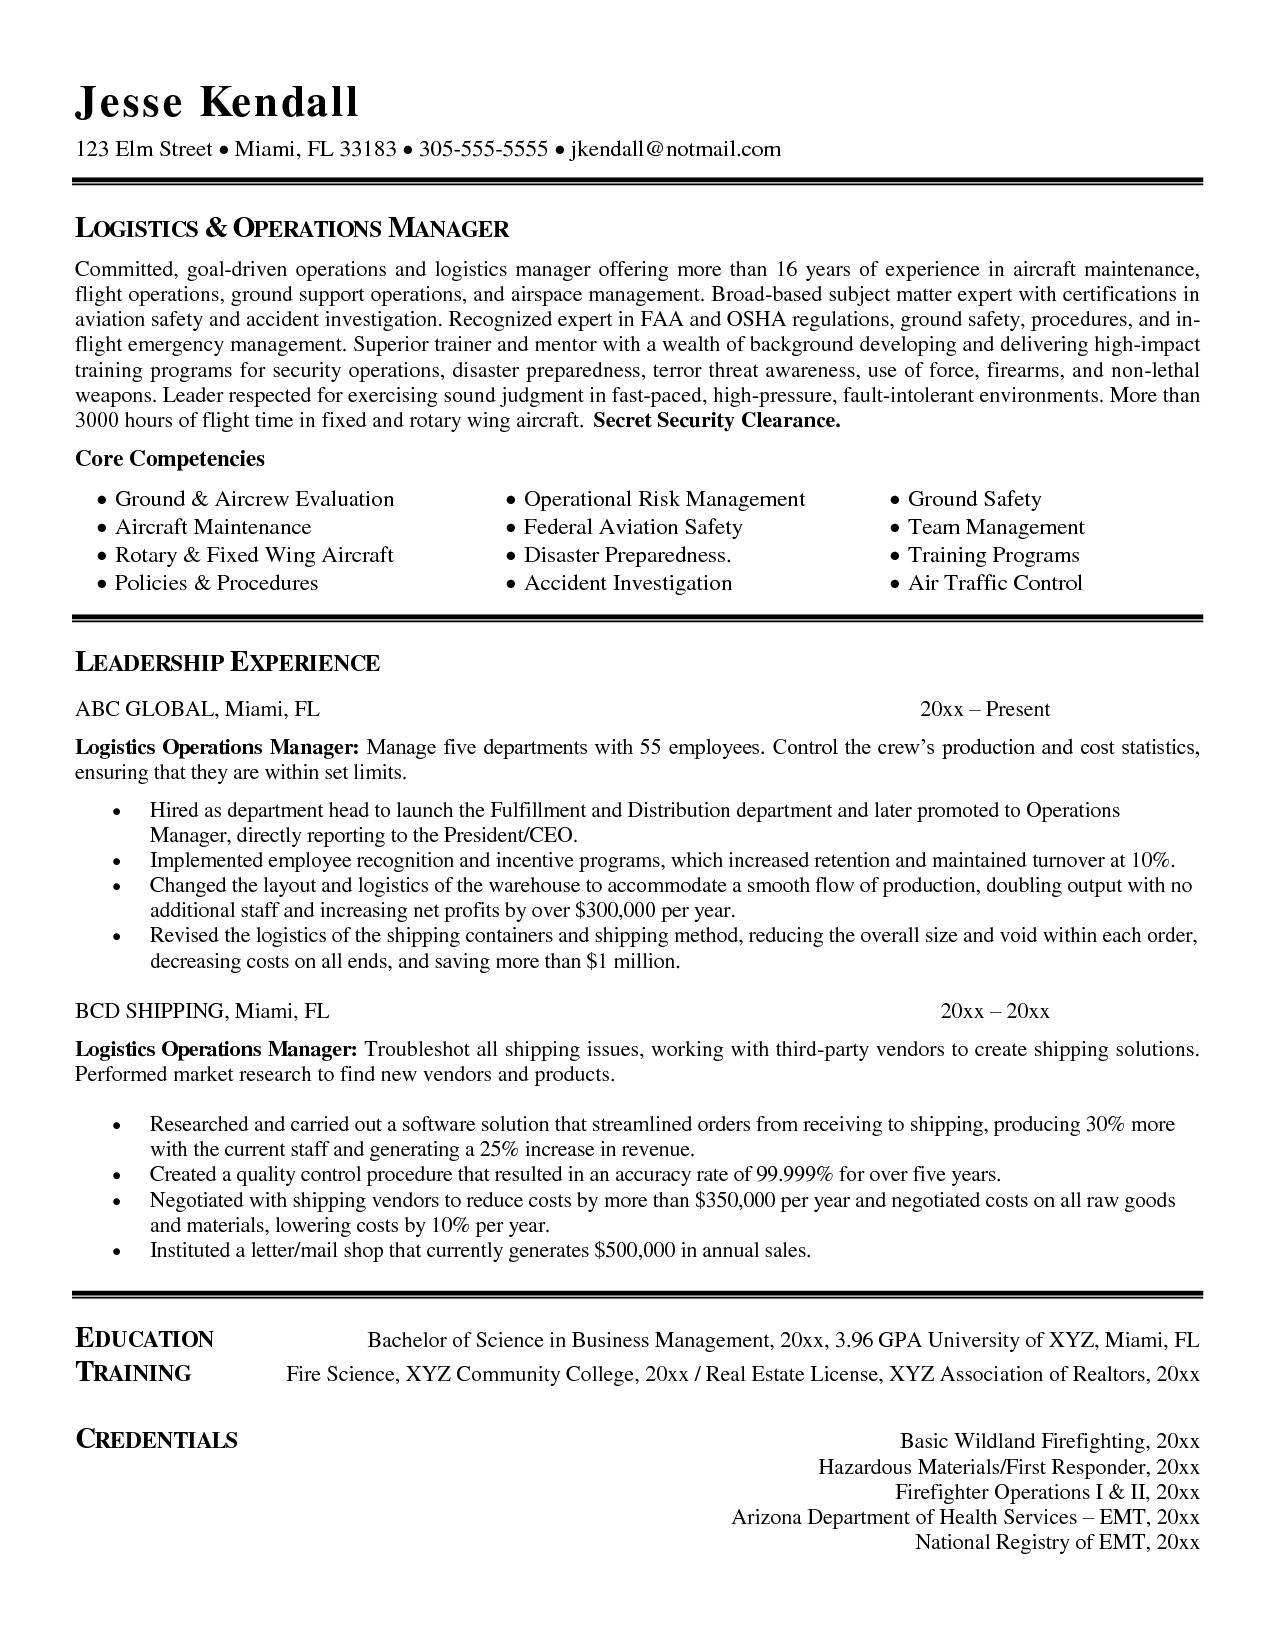 Marketing Operations Executive Resume Http Www Resumecareer Info Marketing Operations Executive Resume 2 Proposal Tulisan Wawancara